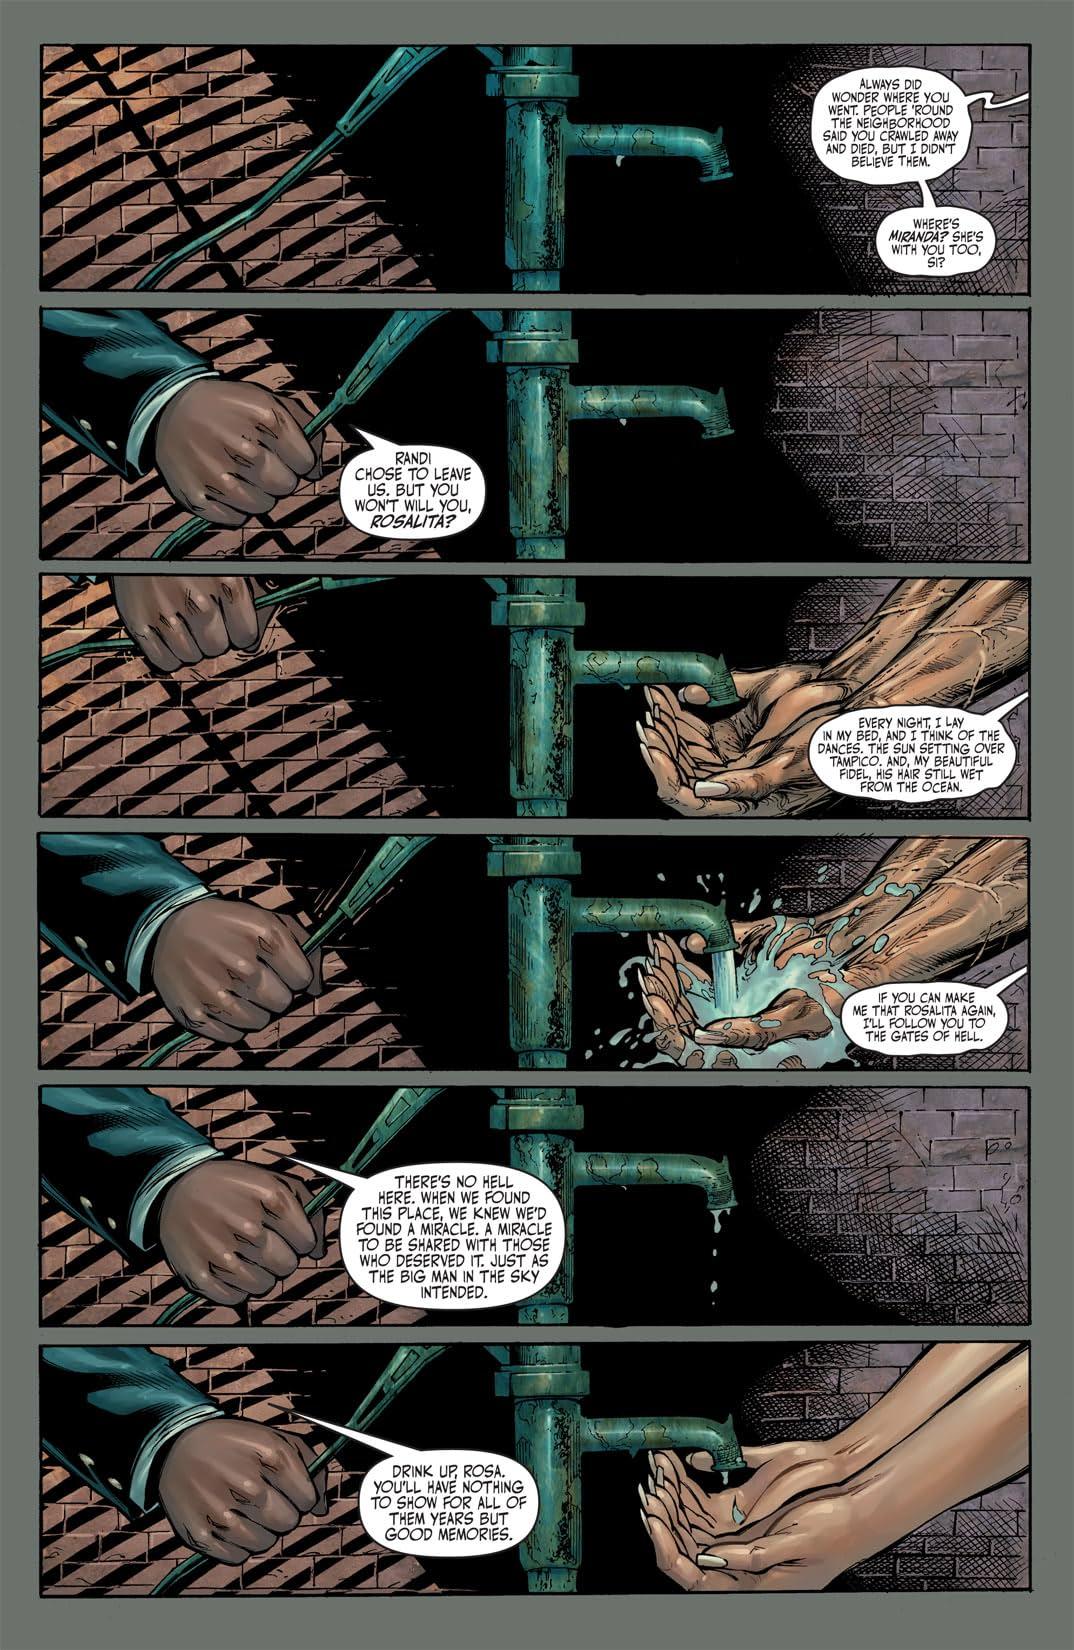 Witchblade #152